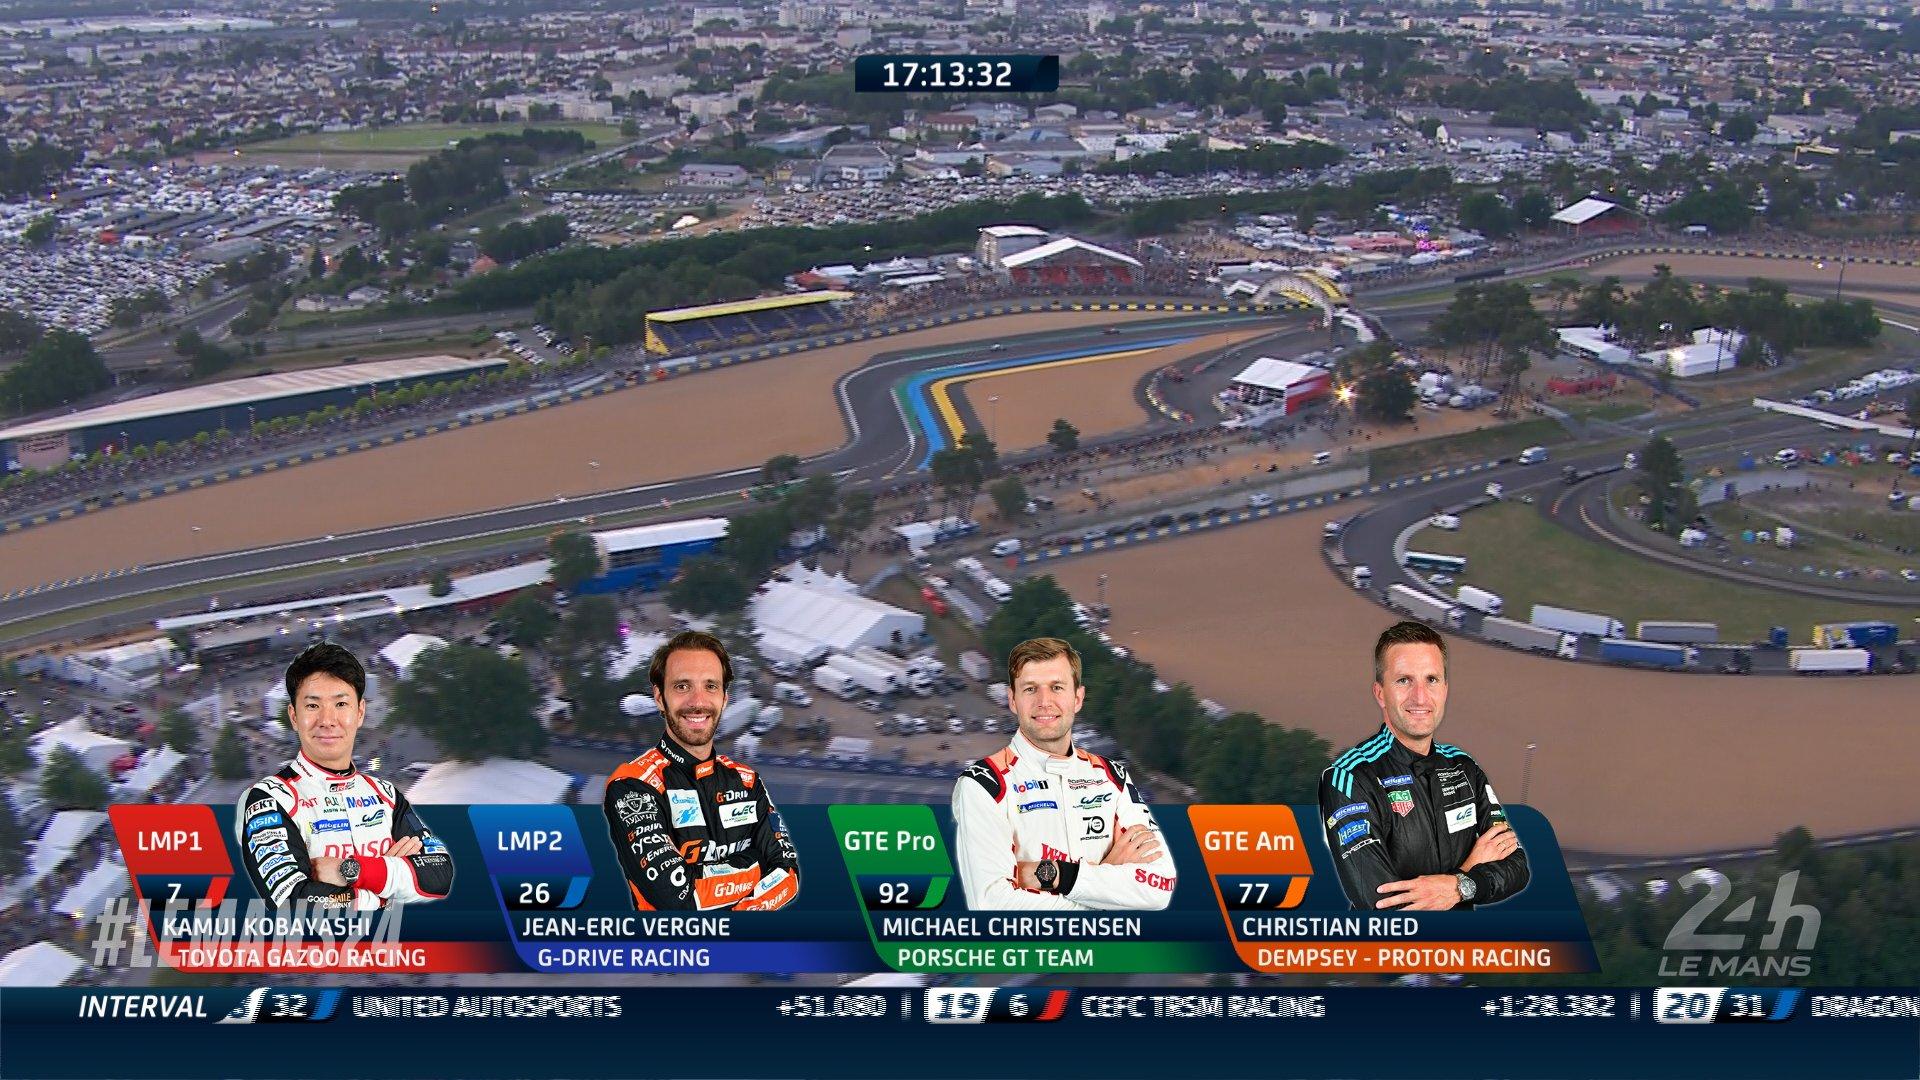 24 Horas de Le Mans 2018 - Página 3 Df1mrR1WAAA0d65